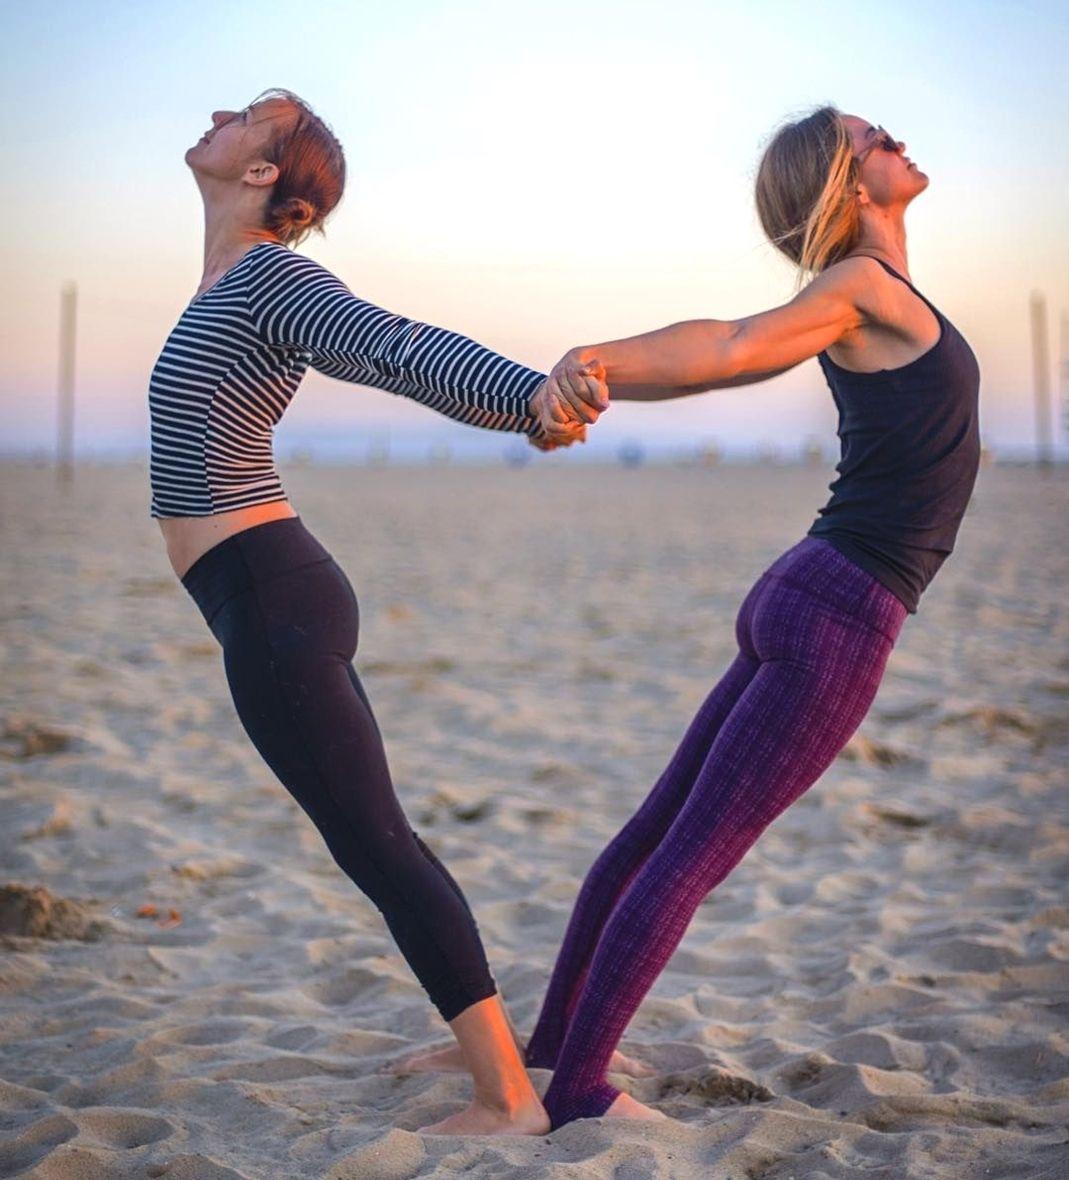 ashtanga yoga poses #partneryoga  Yoga poses for two, Yoga